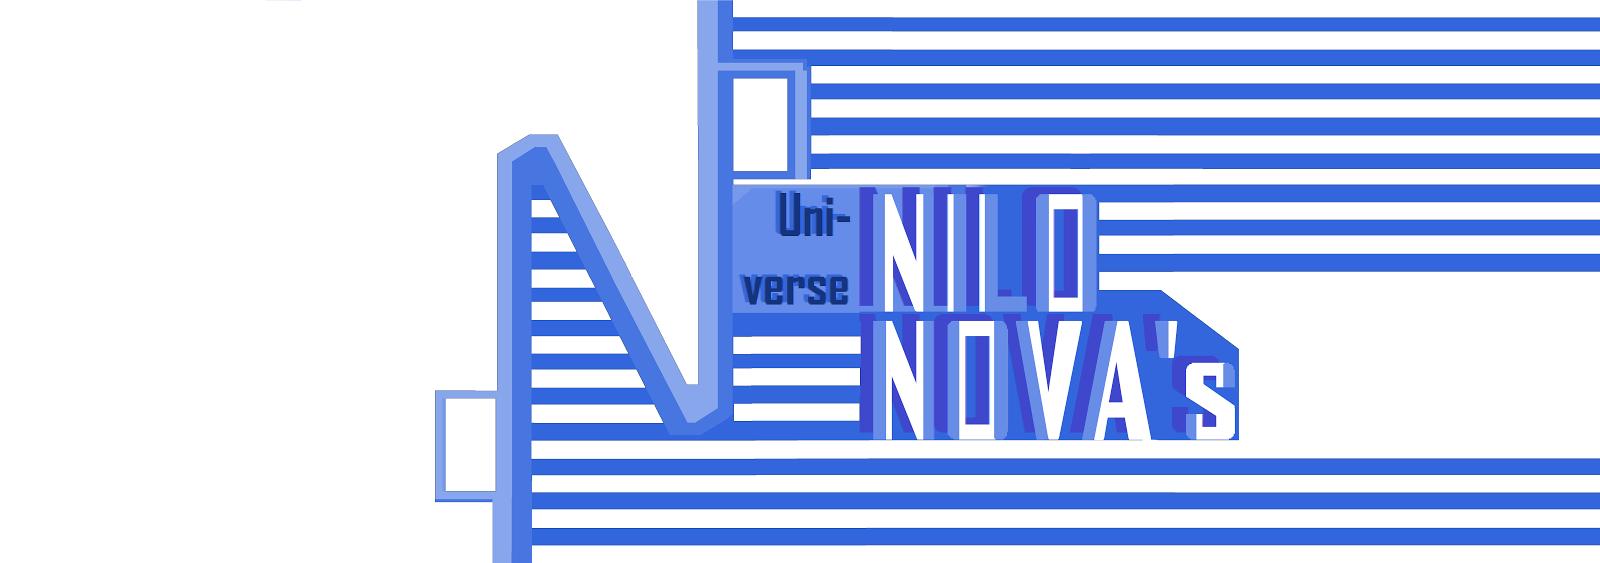 Nilo Nova's Universe